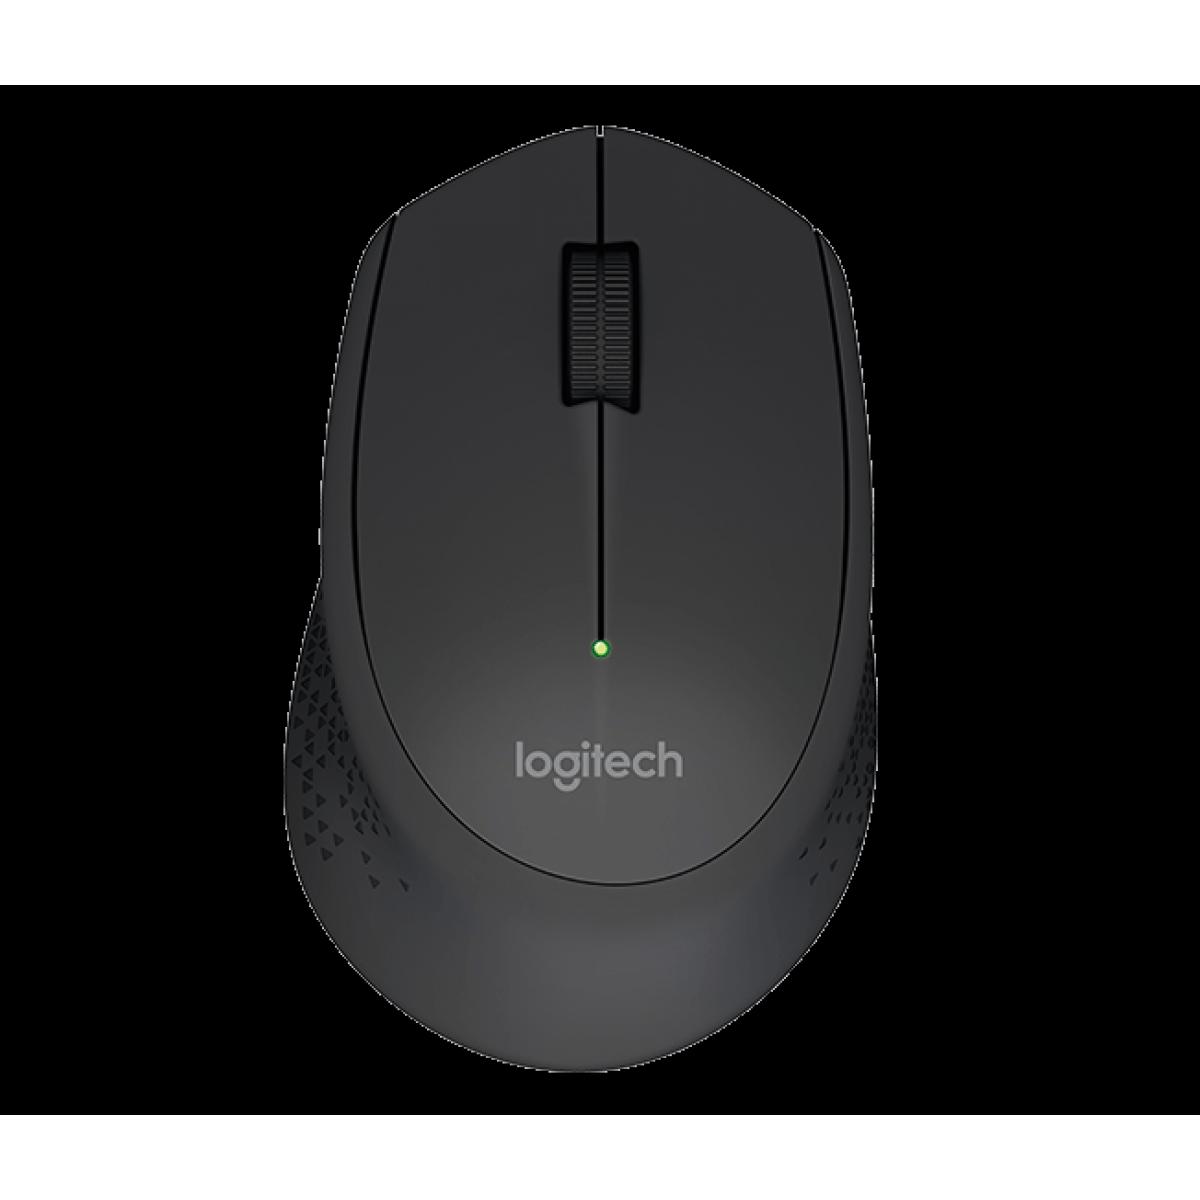 Mouse Logitech M280 1000 DPI, Wireless, Black, 910-004284